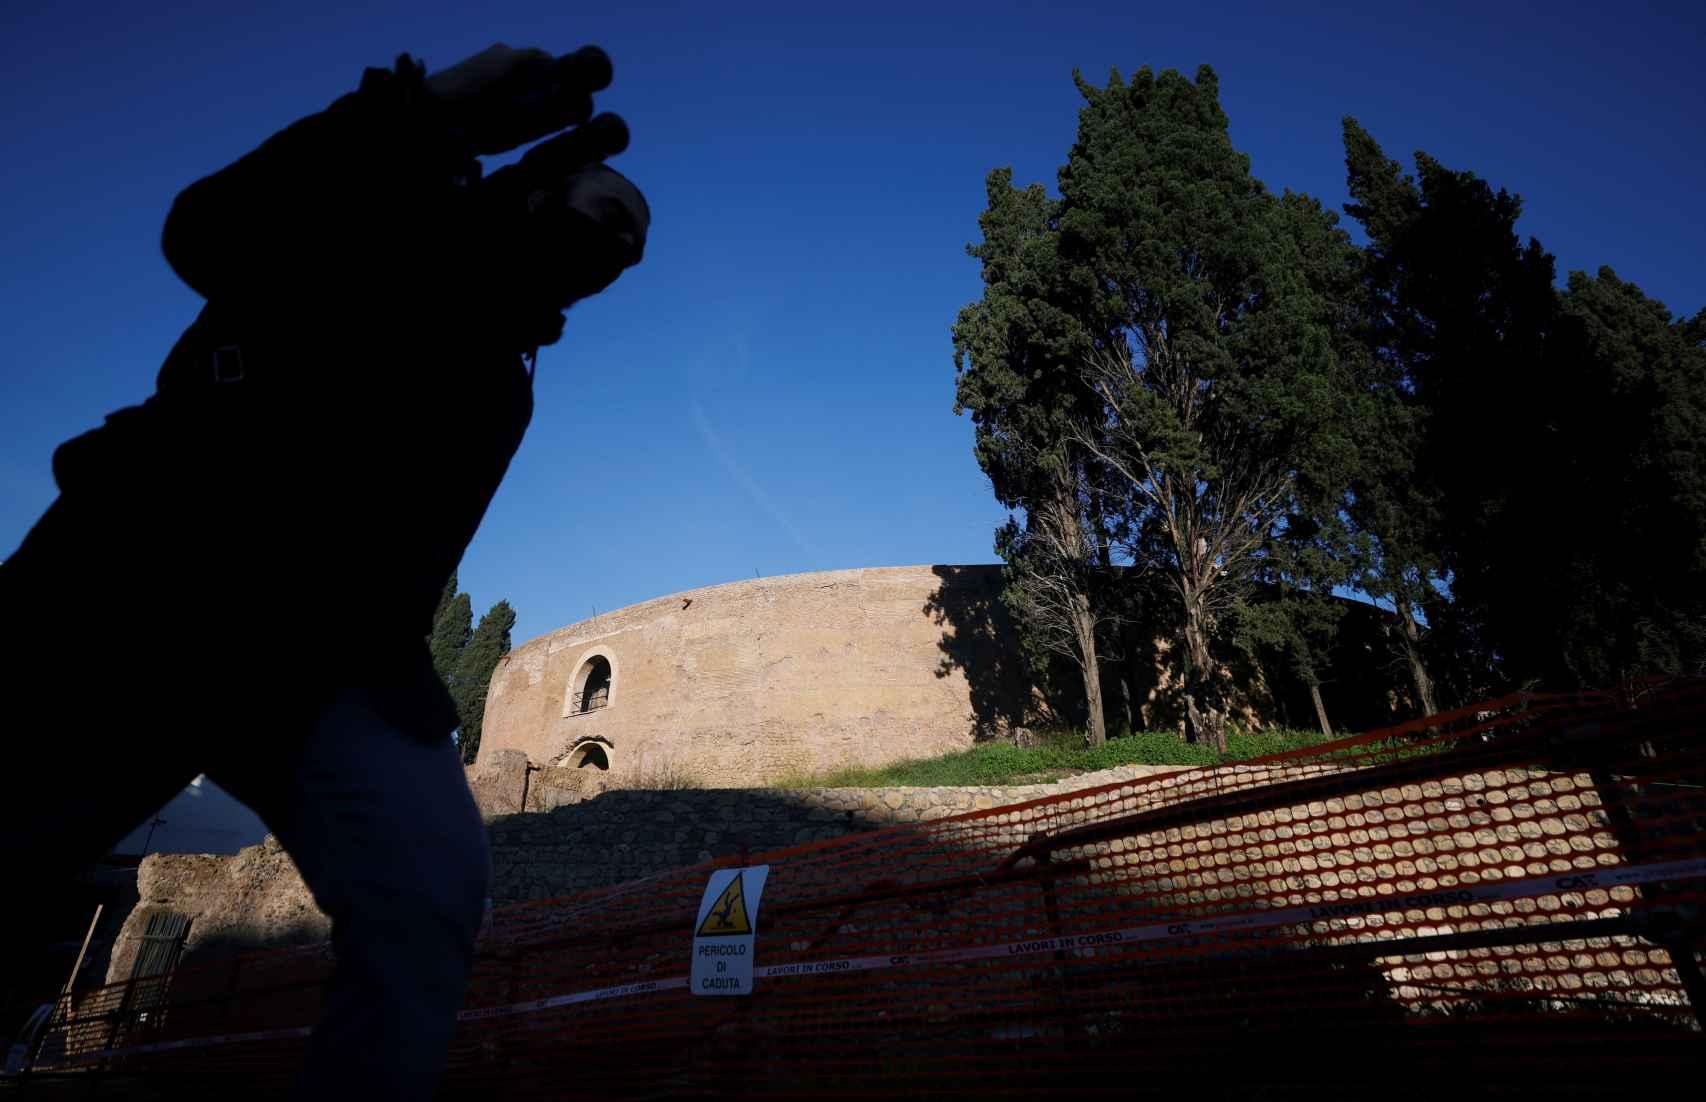 Vista exterior del mausoleo de Augusto.